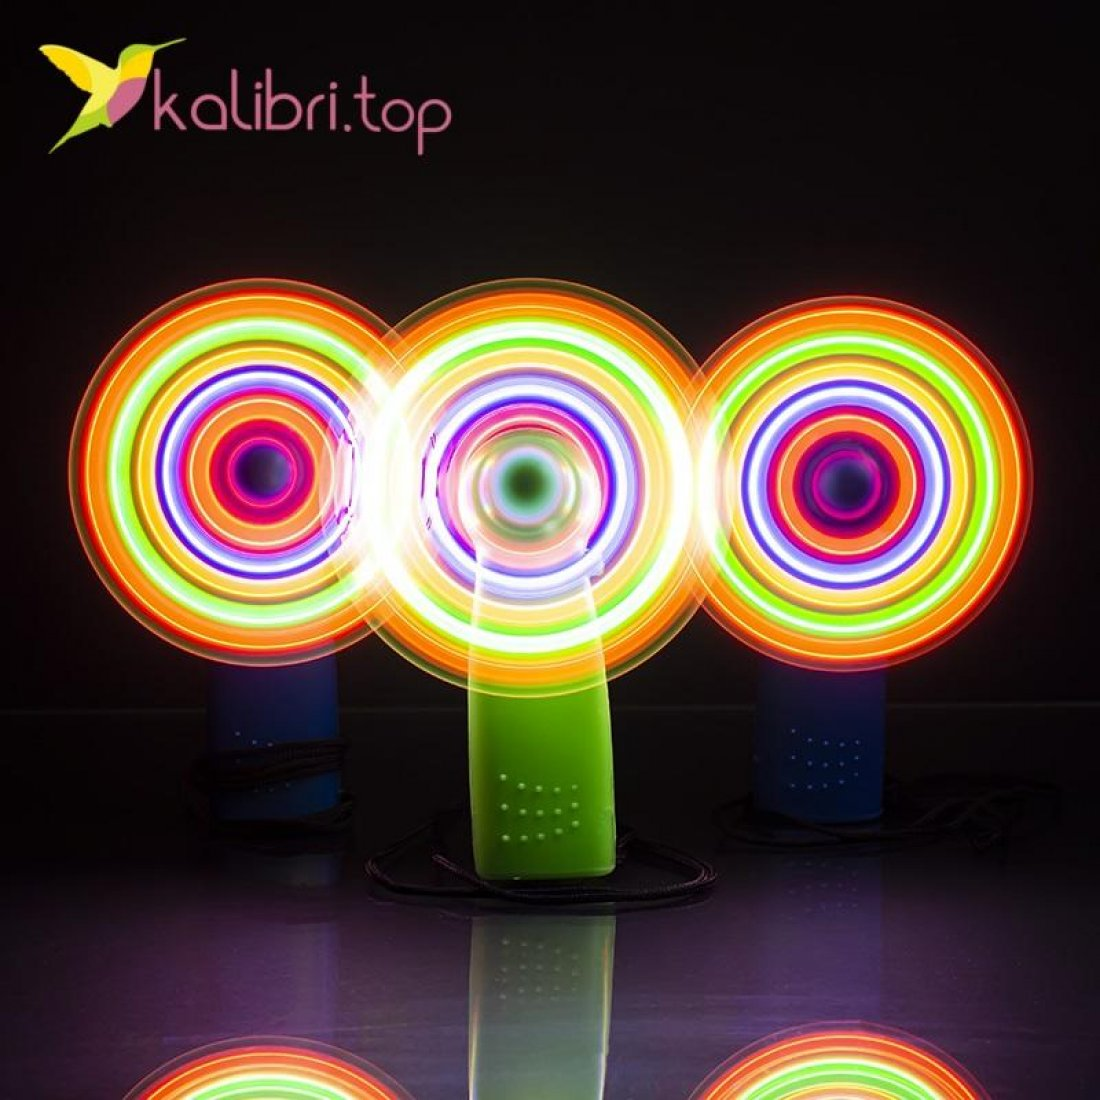 Светящийся вентилятор на шнурке оптом фото 88